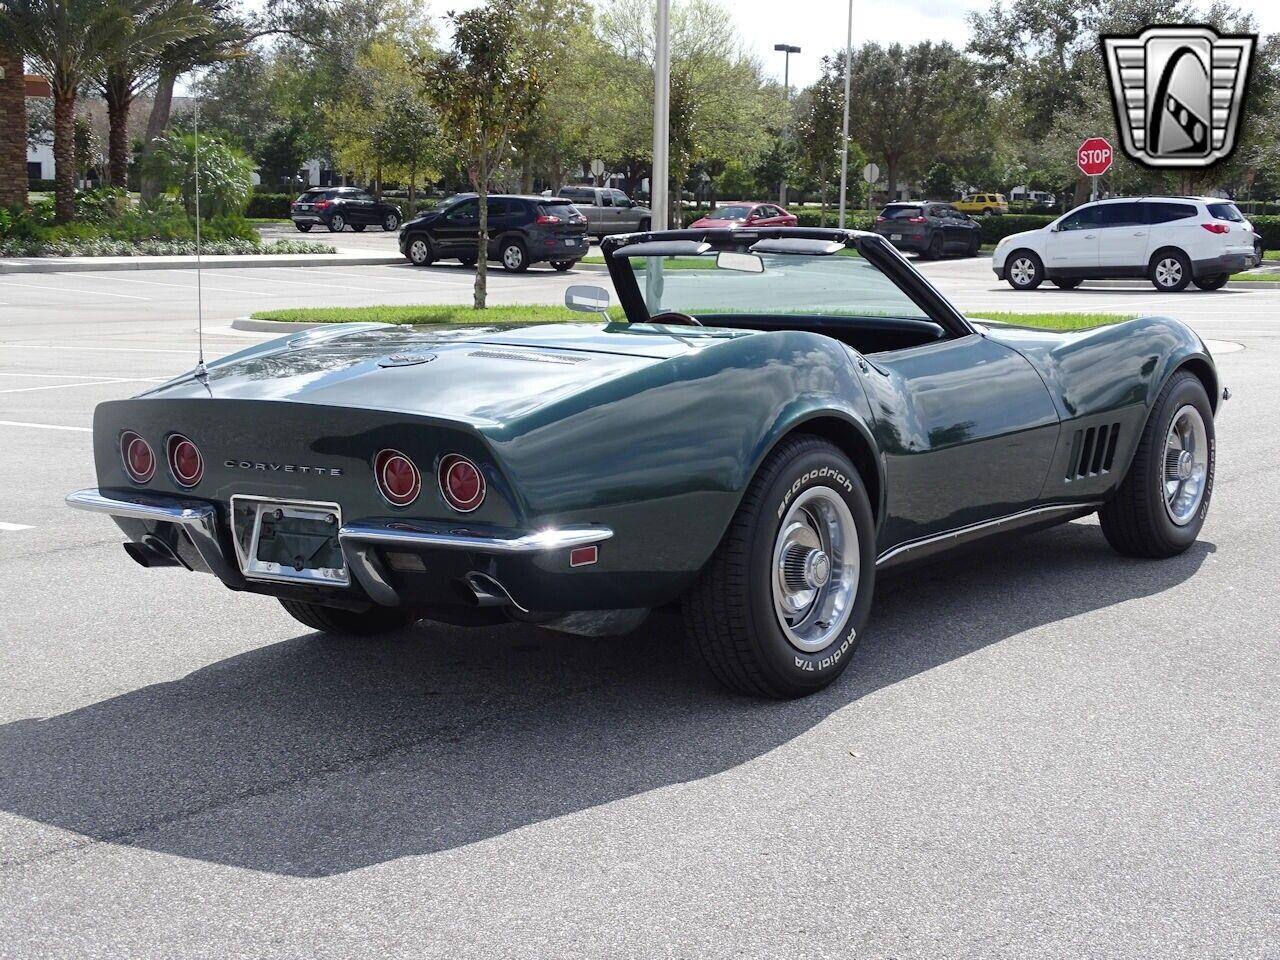 1968 Green Chevrolet Corvette   | C3 Corvette Photo 9